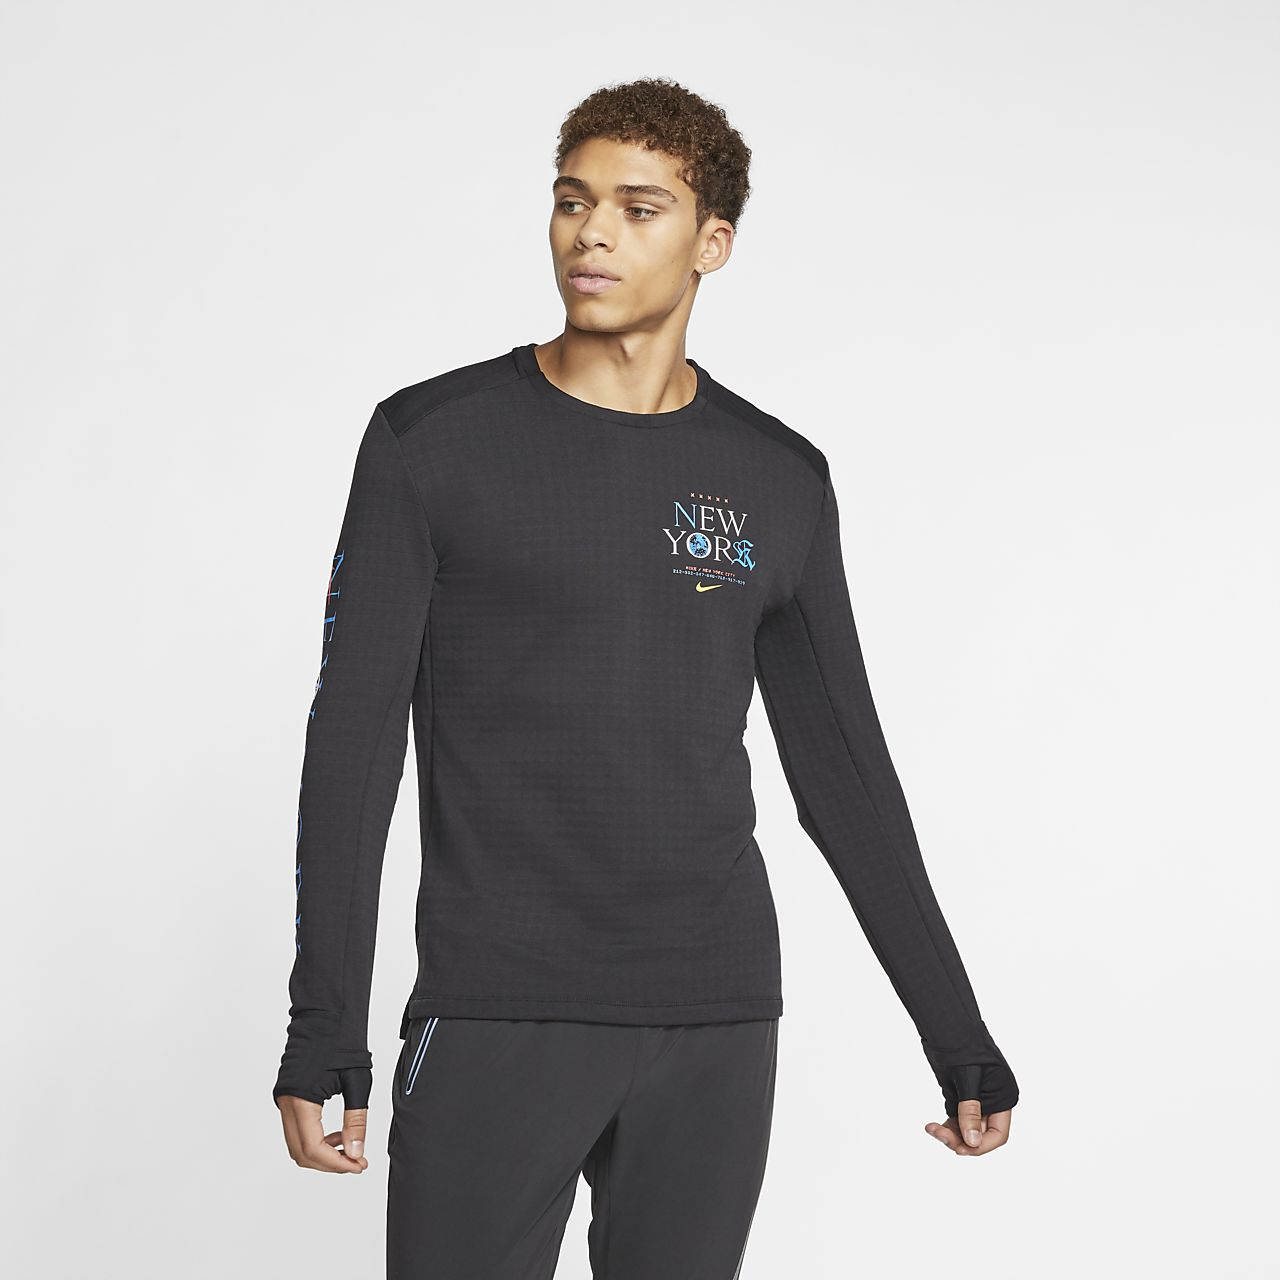 Camisola de running de manga comprida Nike Therma Sphere 3.0 NYC para homem